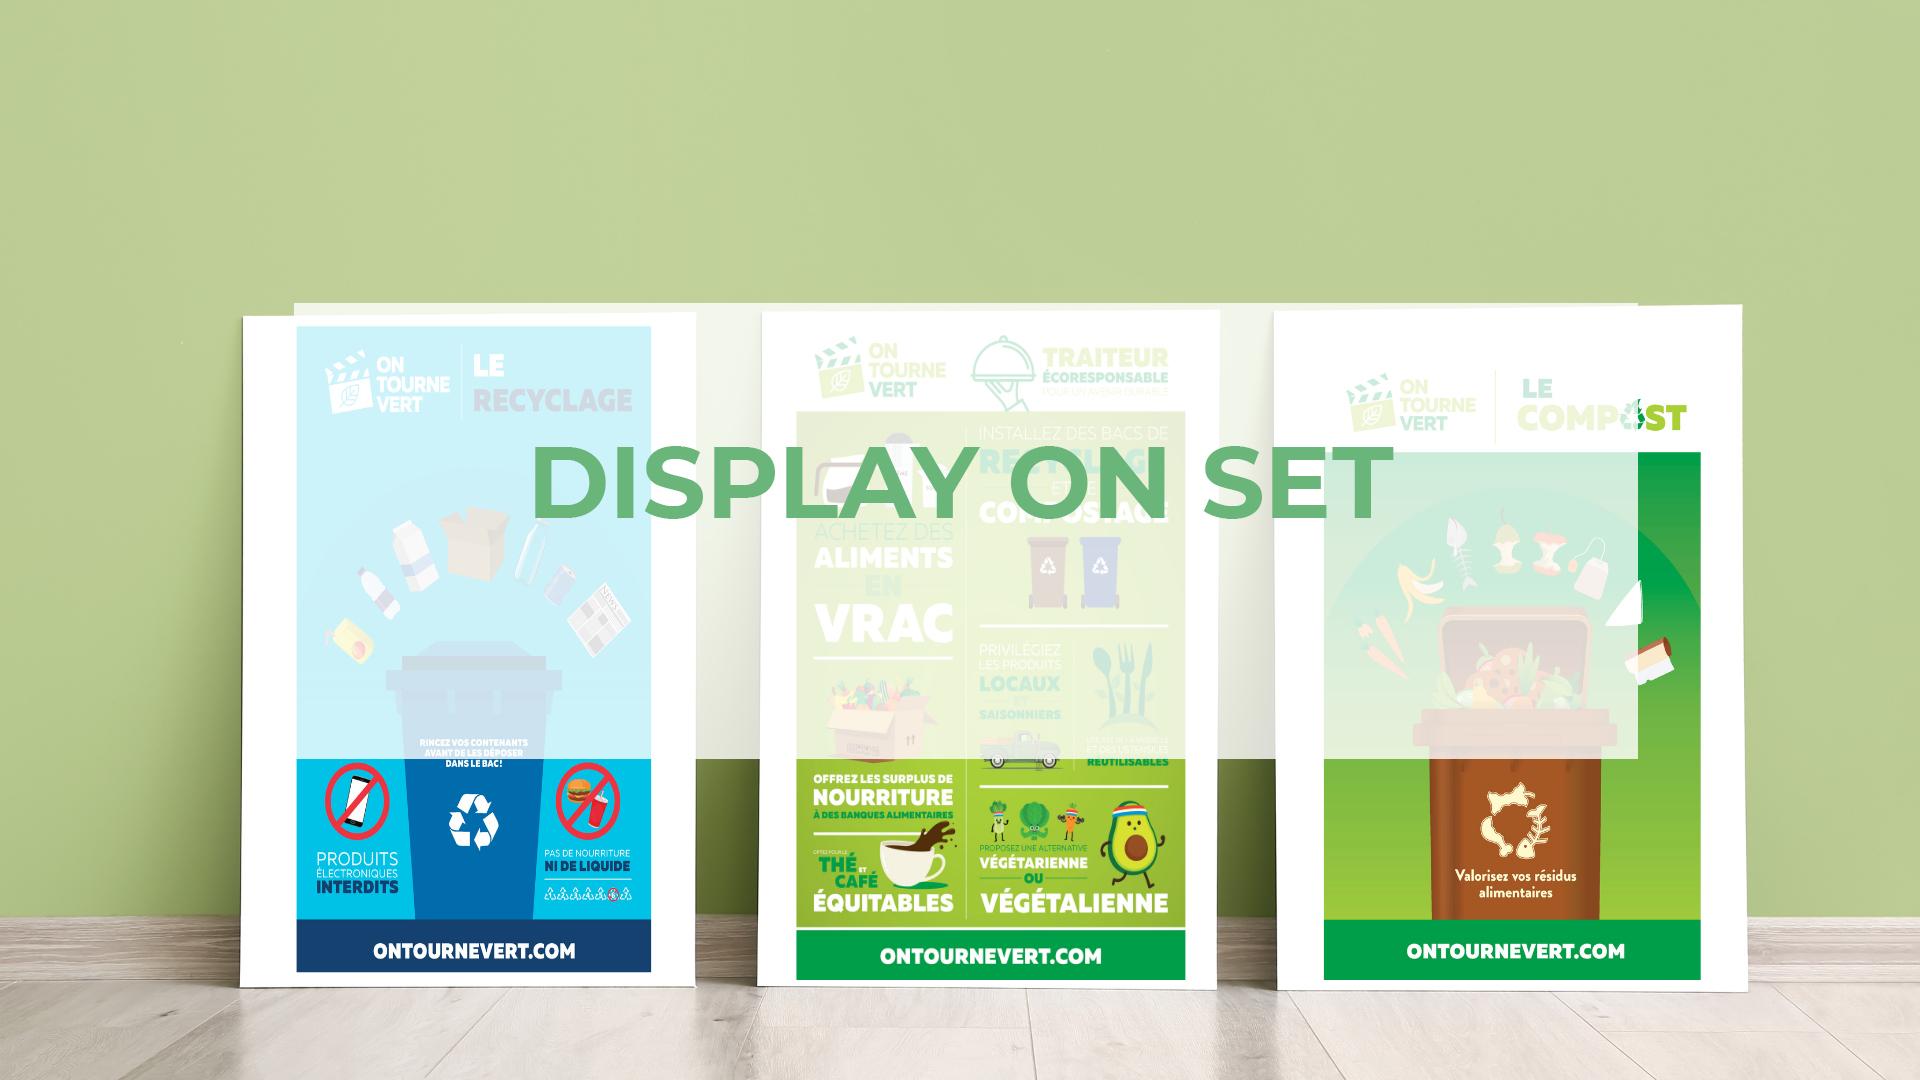 Display-on-set-rolling-green